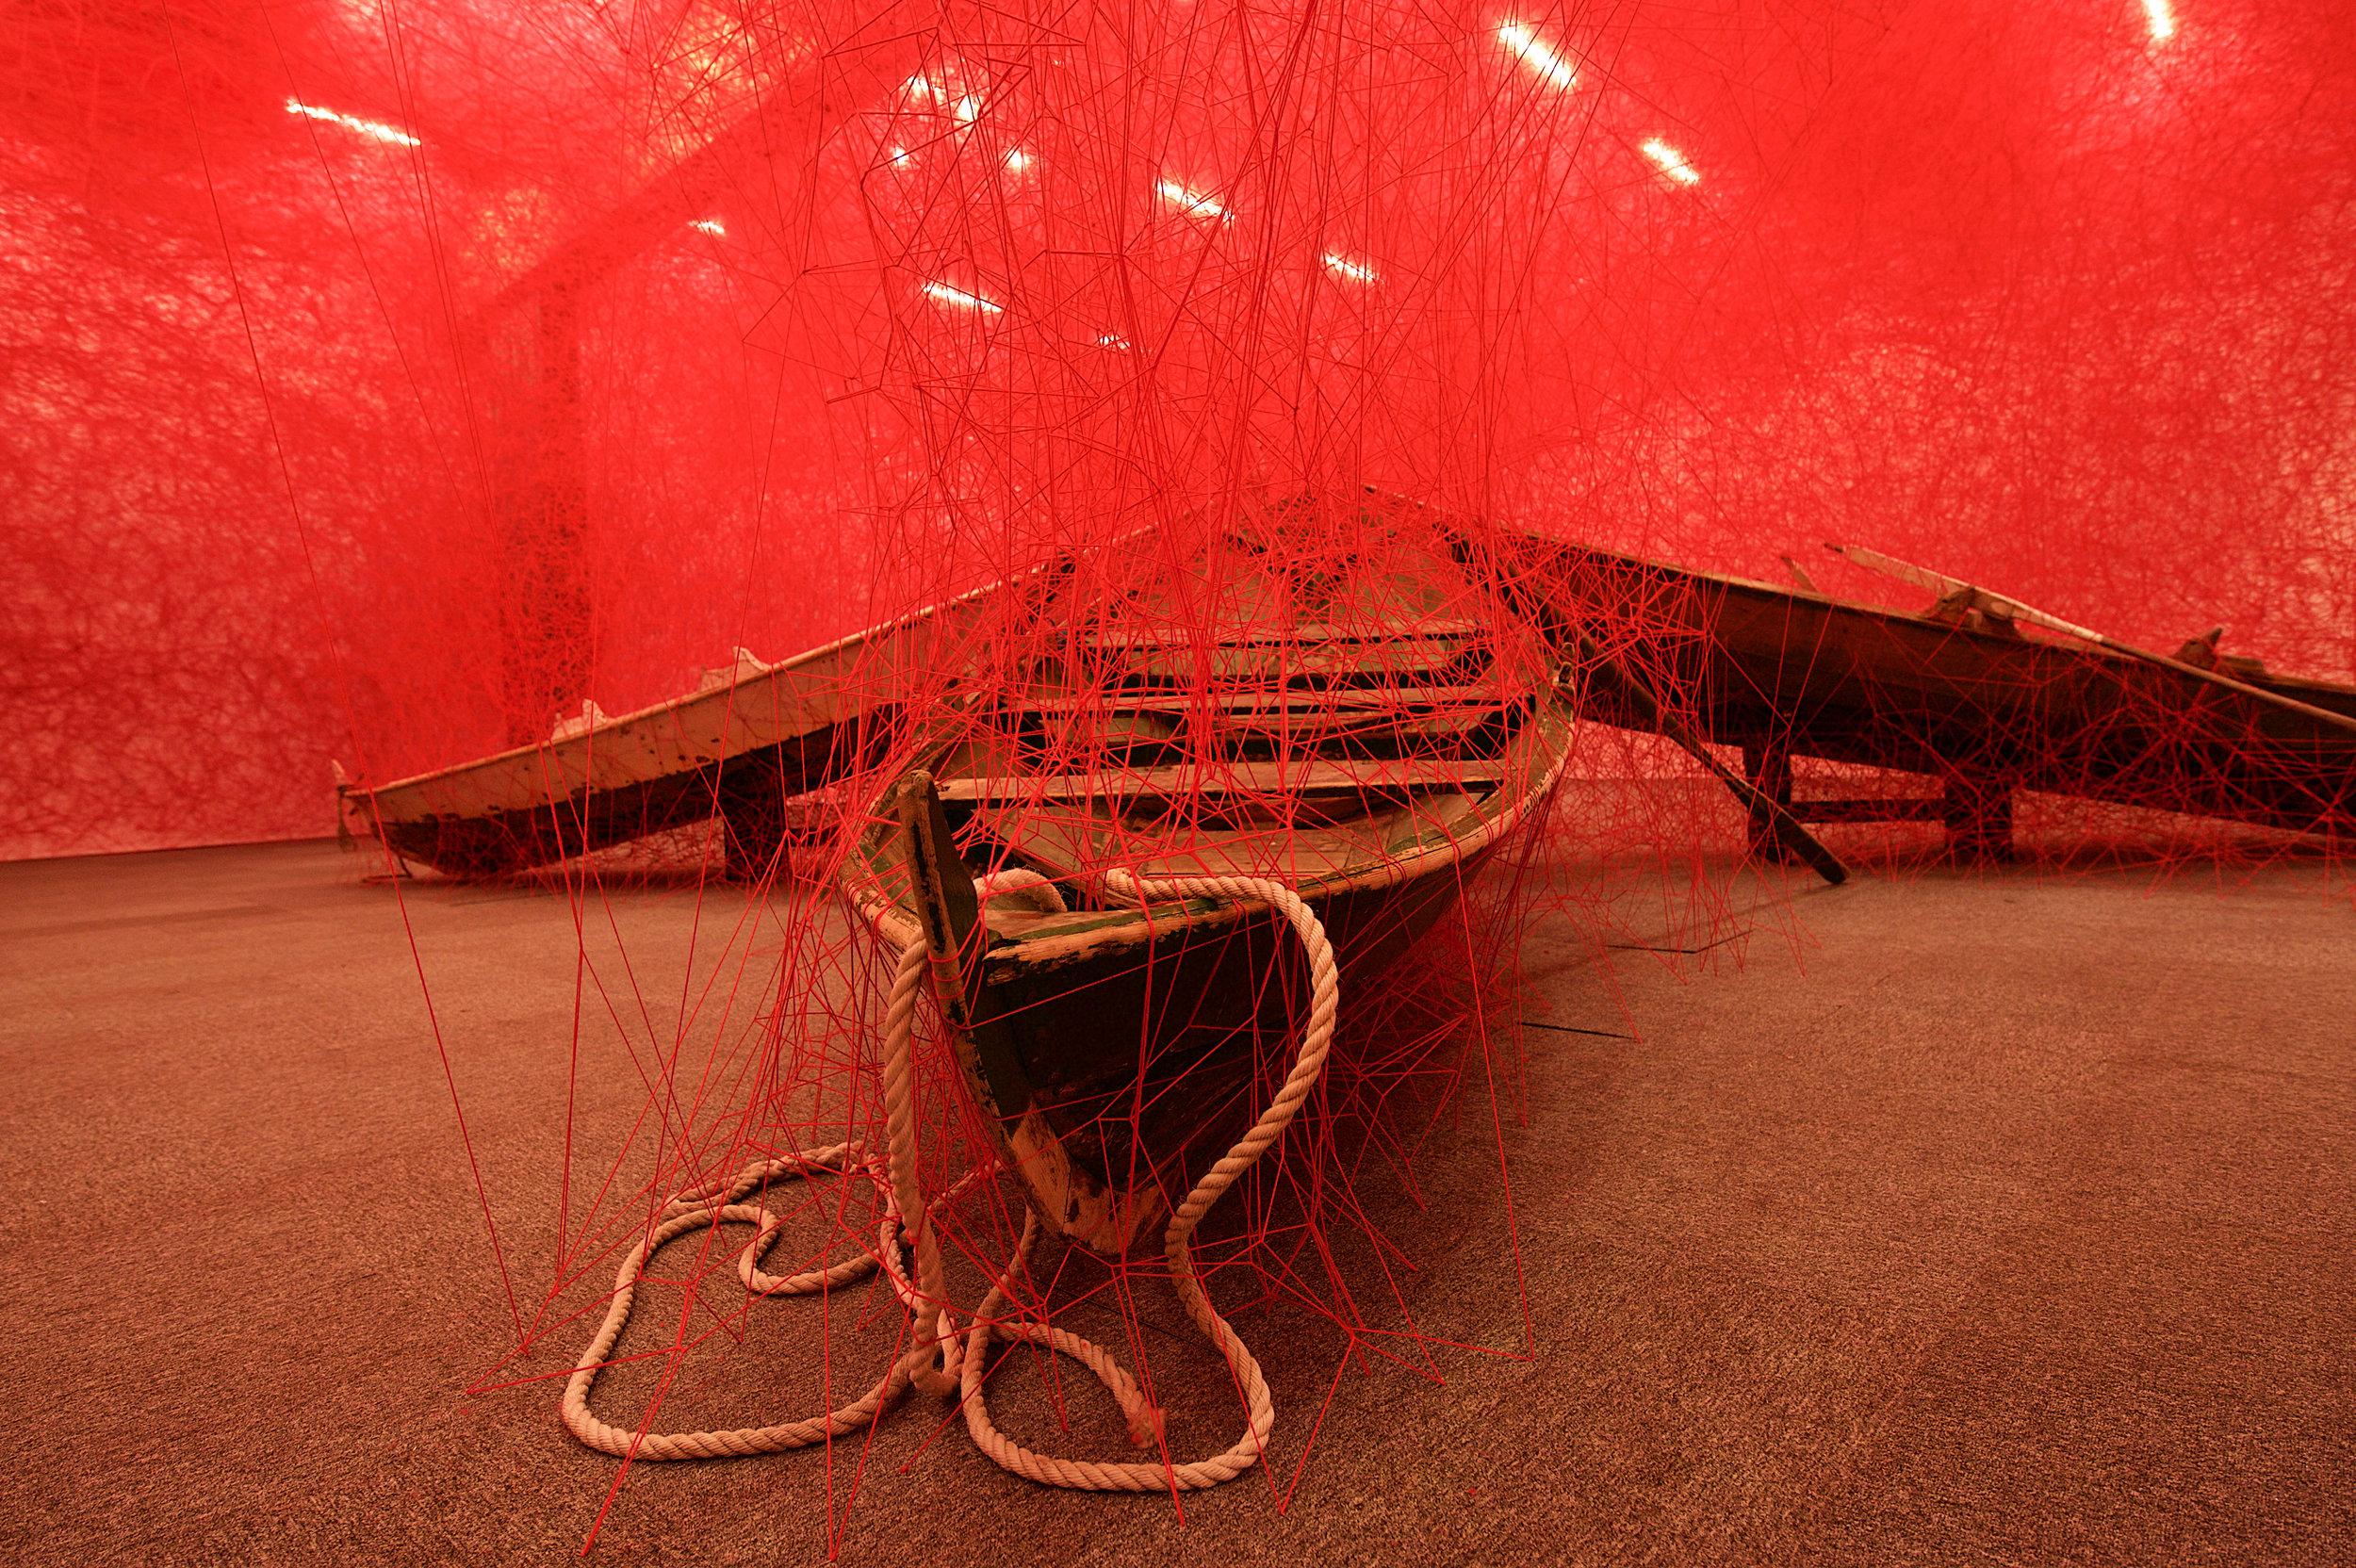 12017_Direction_KODE-ART Museum_Bergen,Norway_Photo Sunhi Mang_26.jpg